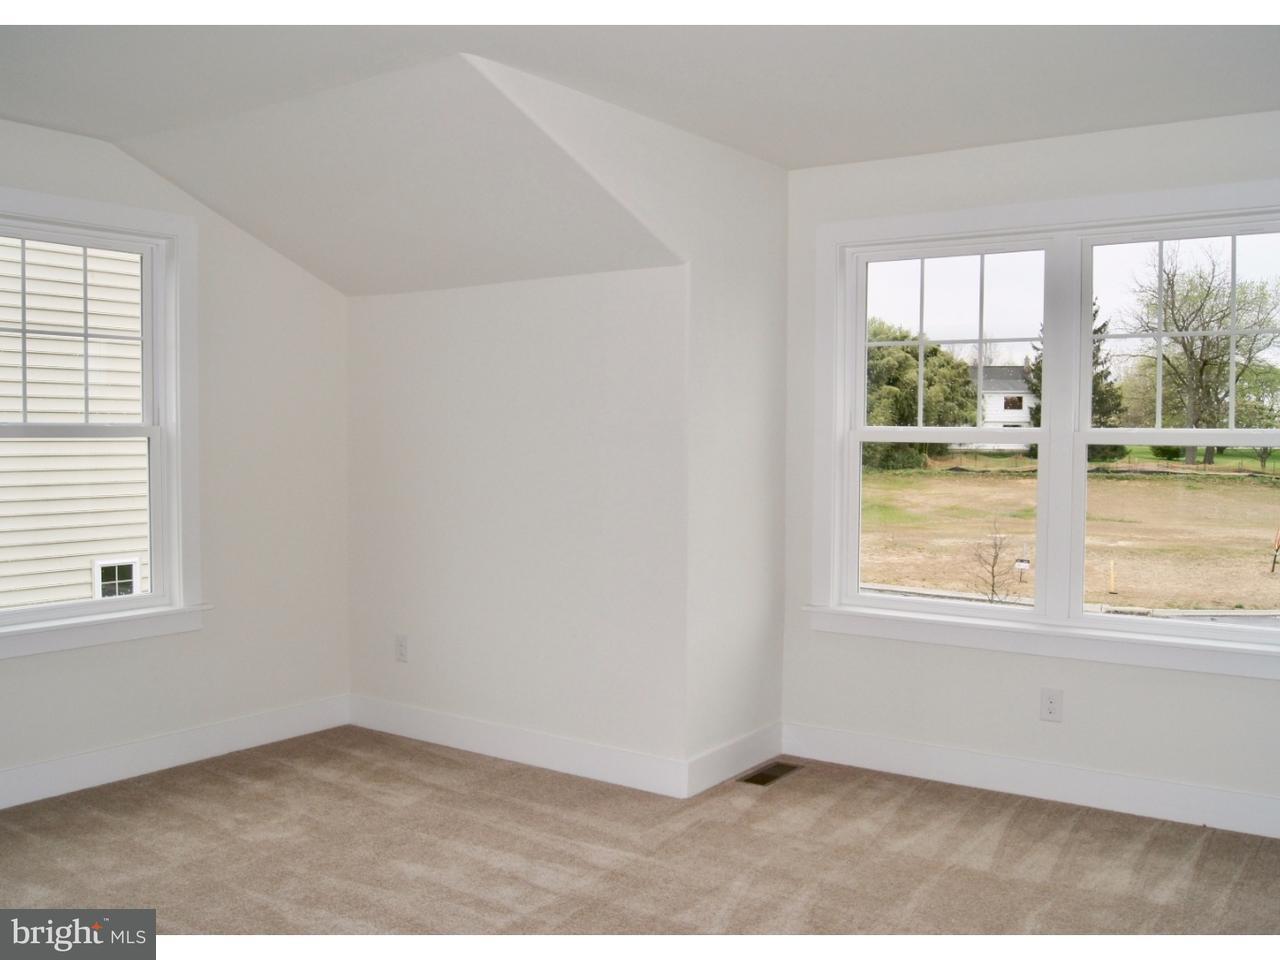 Additional photo for property listing at 154 SALEM WAY  West Grove, Pennsylvania 19390 Estados Unidos